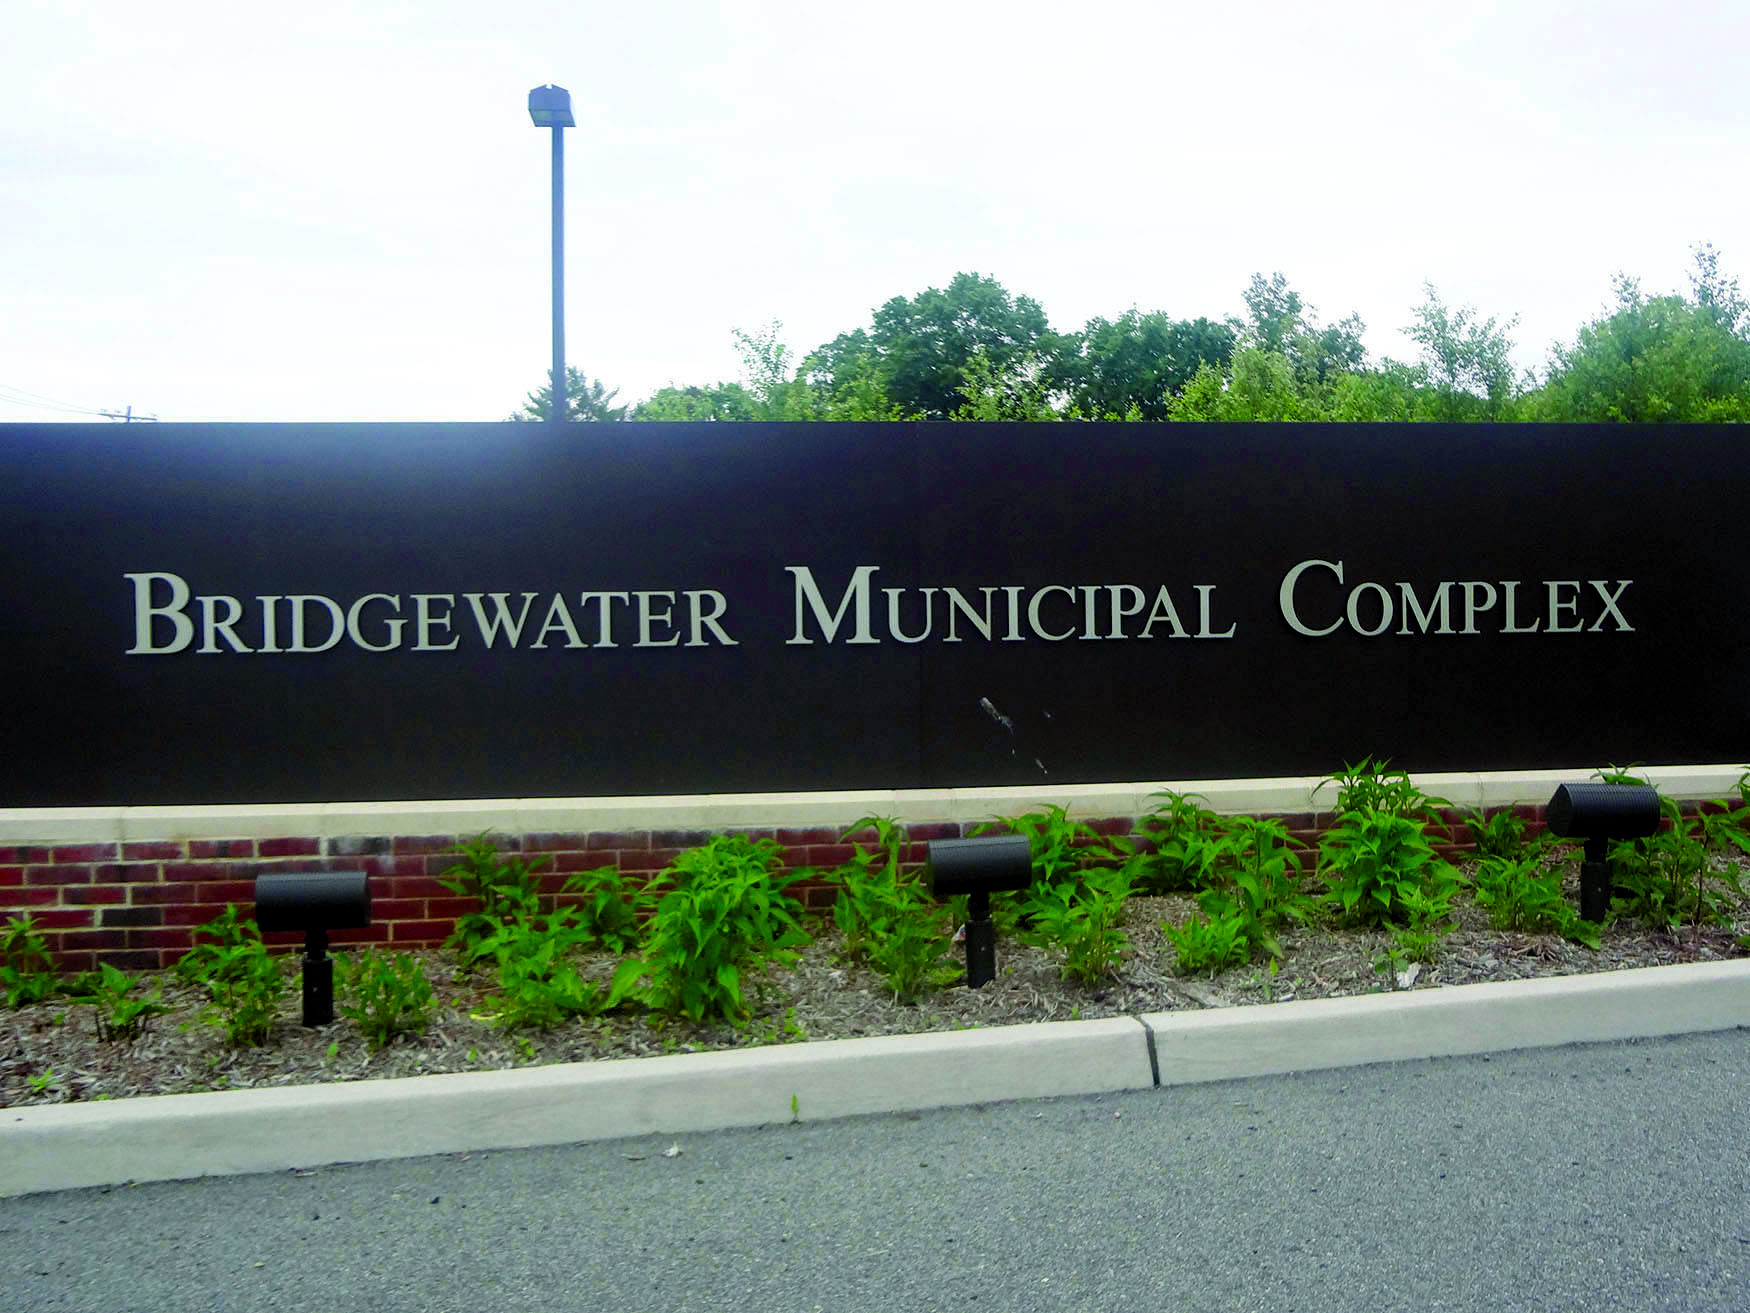 4ed48e966c6215a08e7d_Bridgewater_municipal.jpg